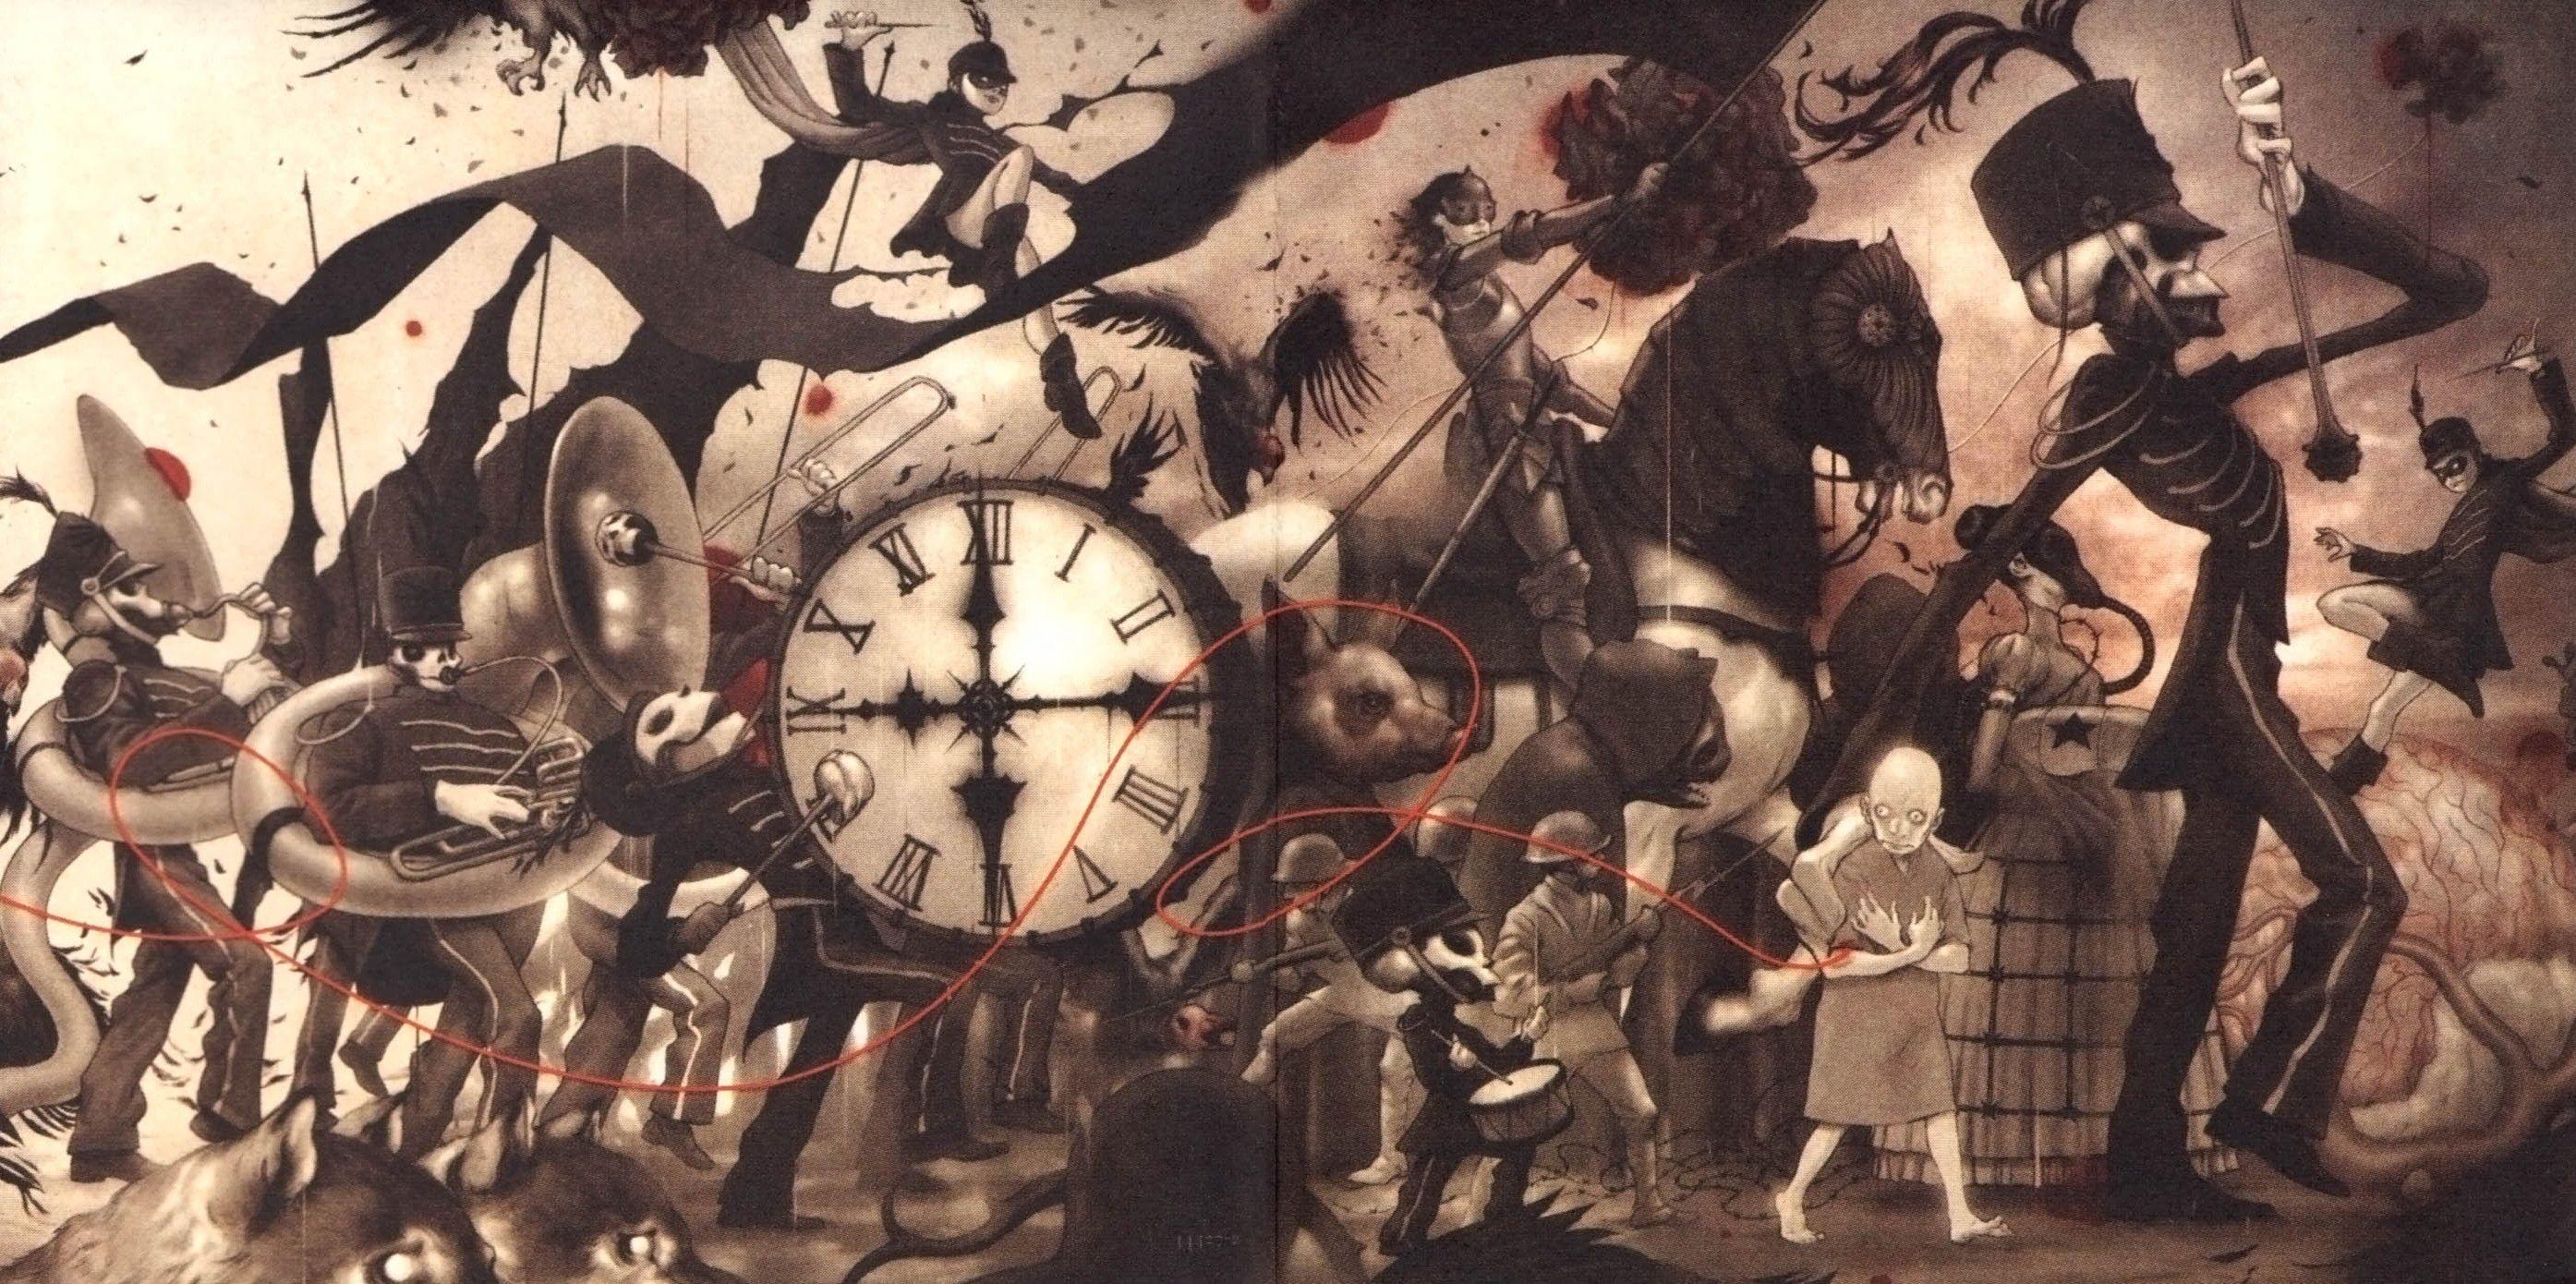 Best 52 The Black Parade Wallpaper on HipWallpaper Pixar Play 2789x1390